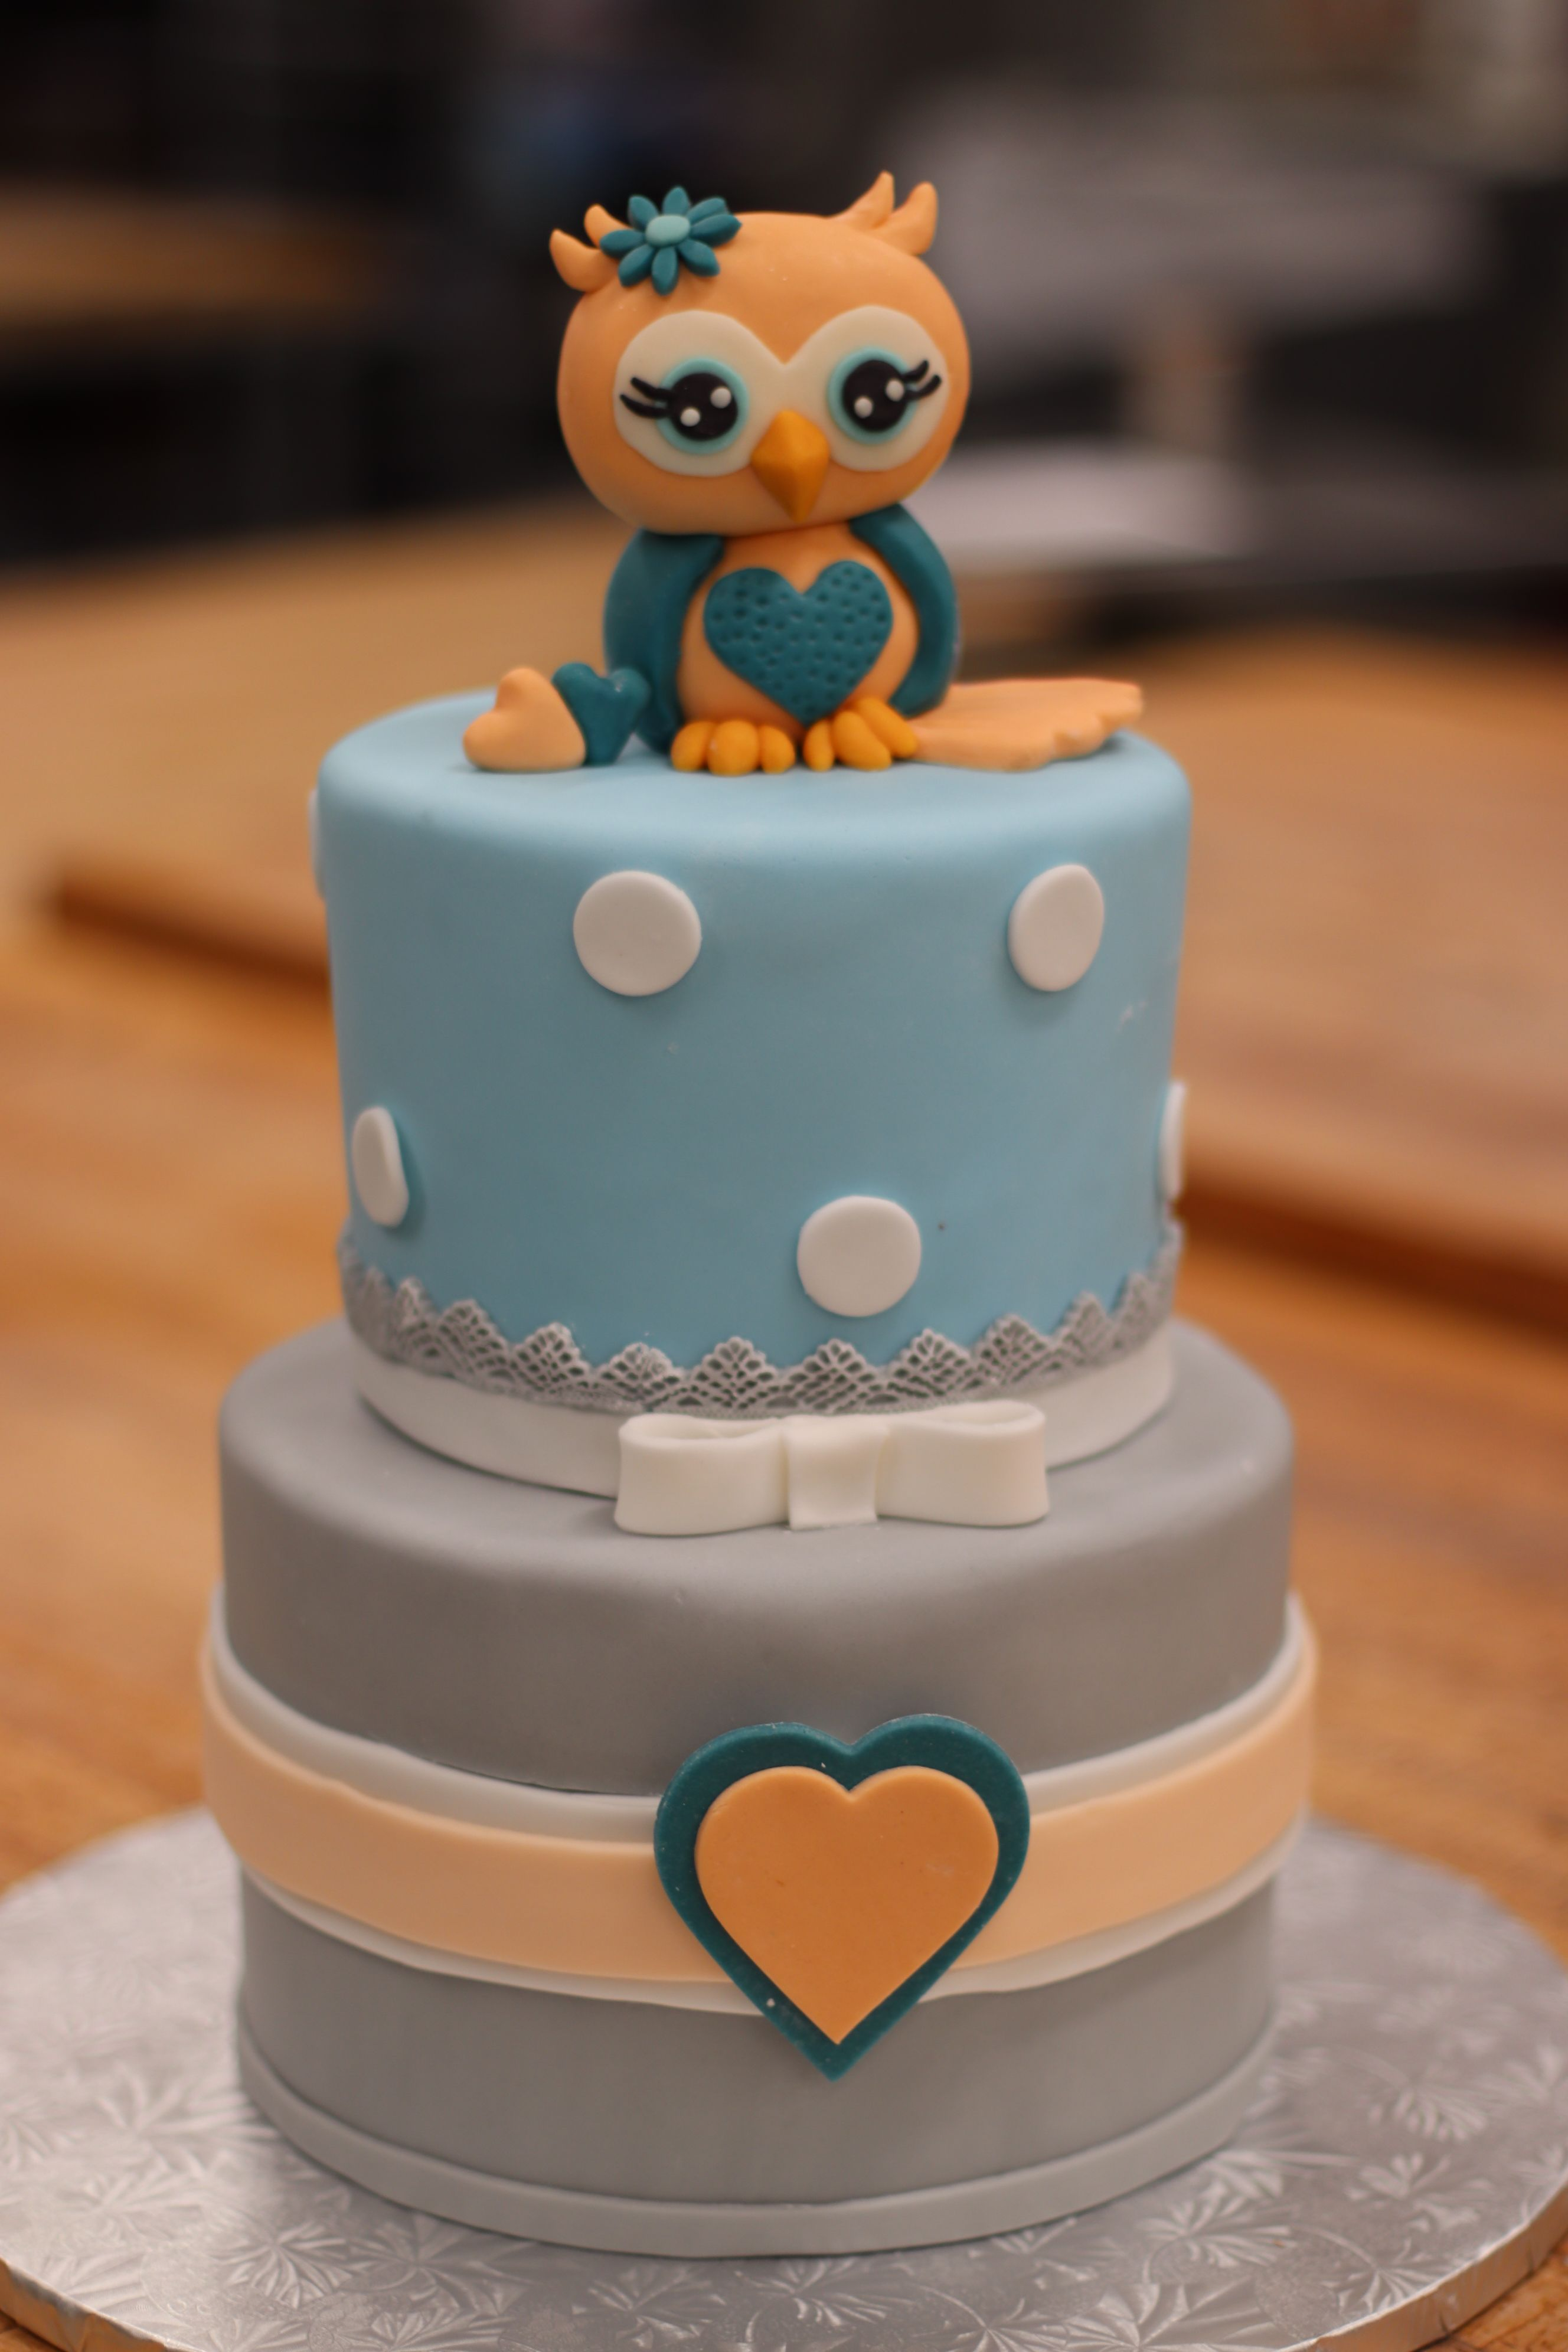 Super A Little Cake Custom Birthday Cakes Wedding Cakes Nj Nyc Funny Birthday Cards Online Chimdamsfinfo